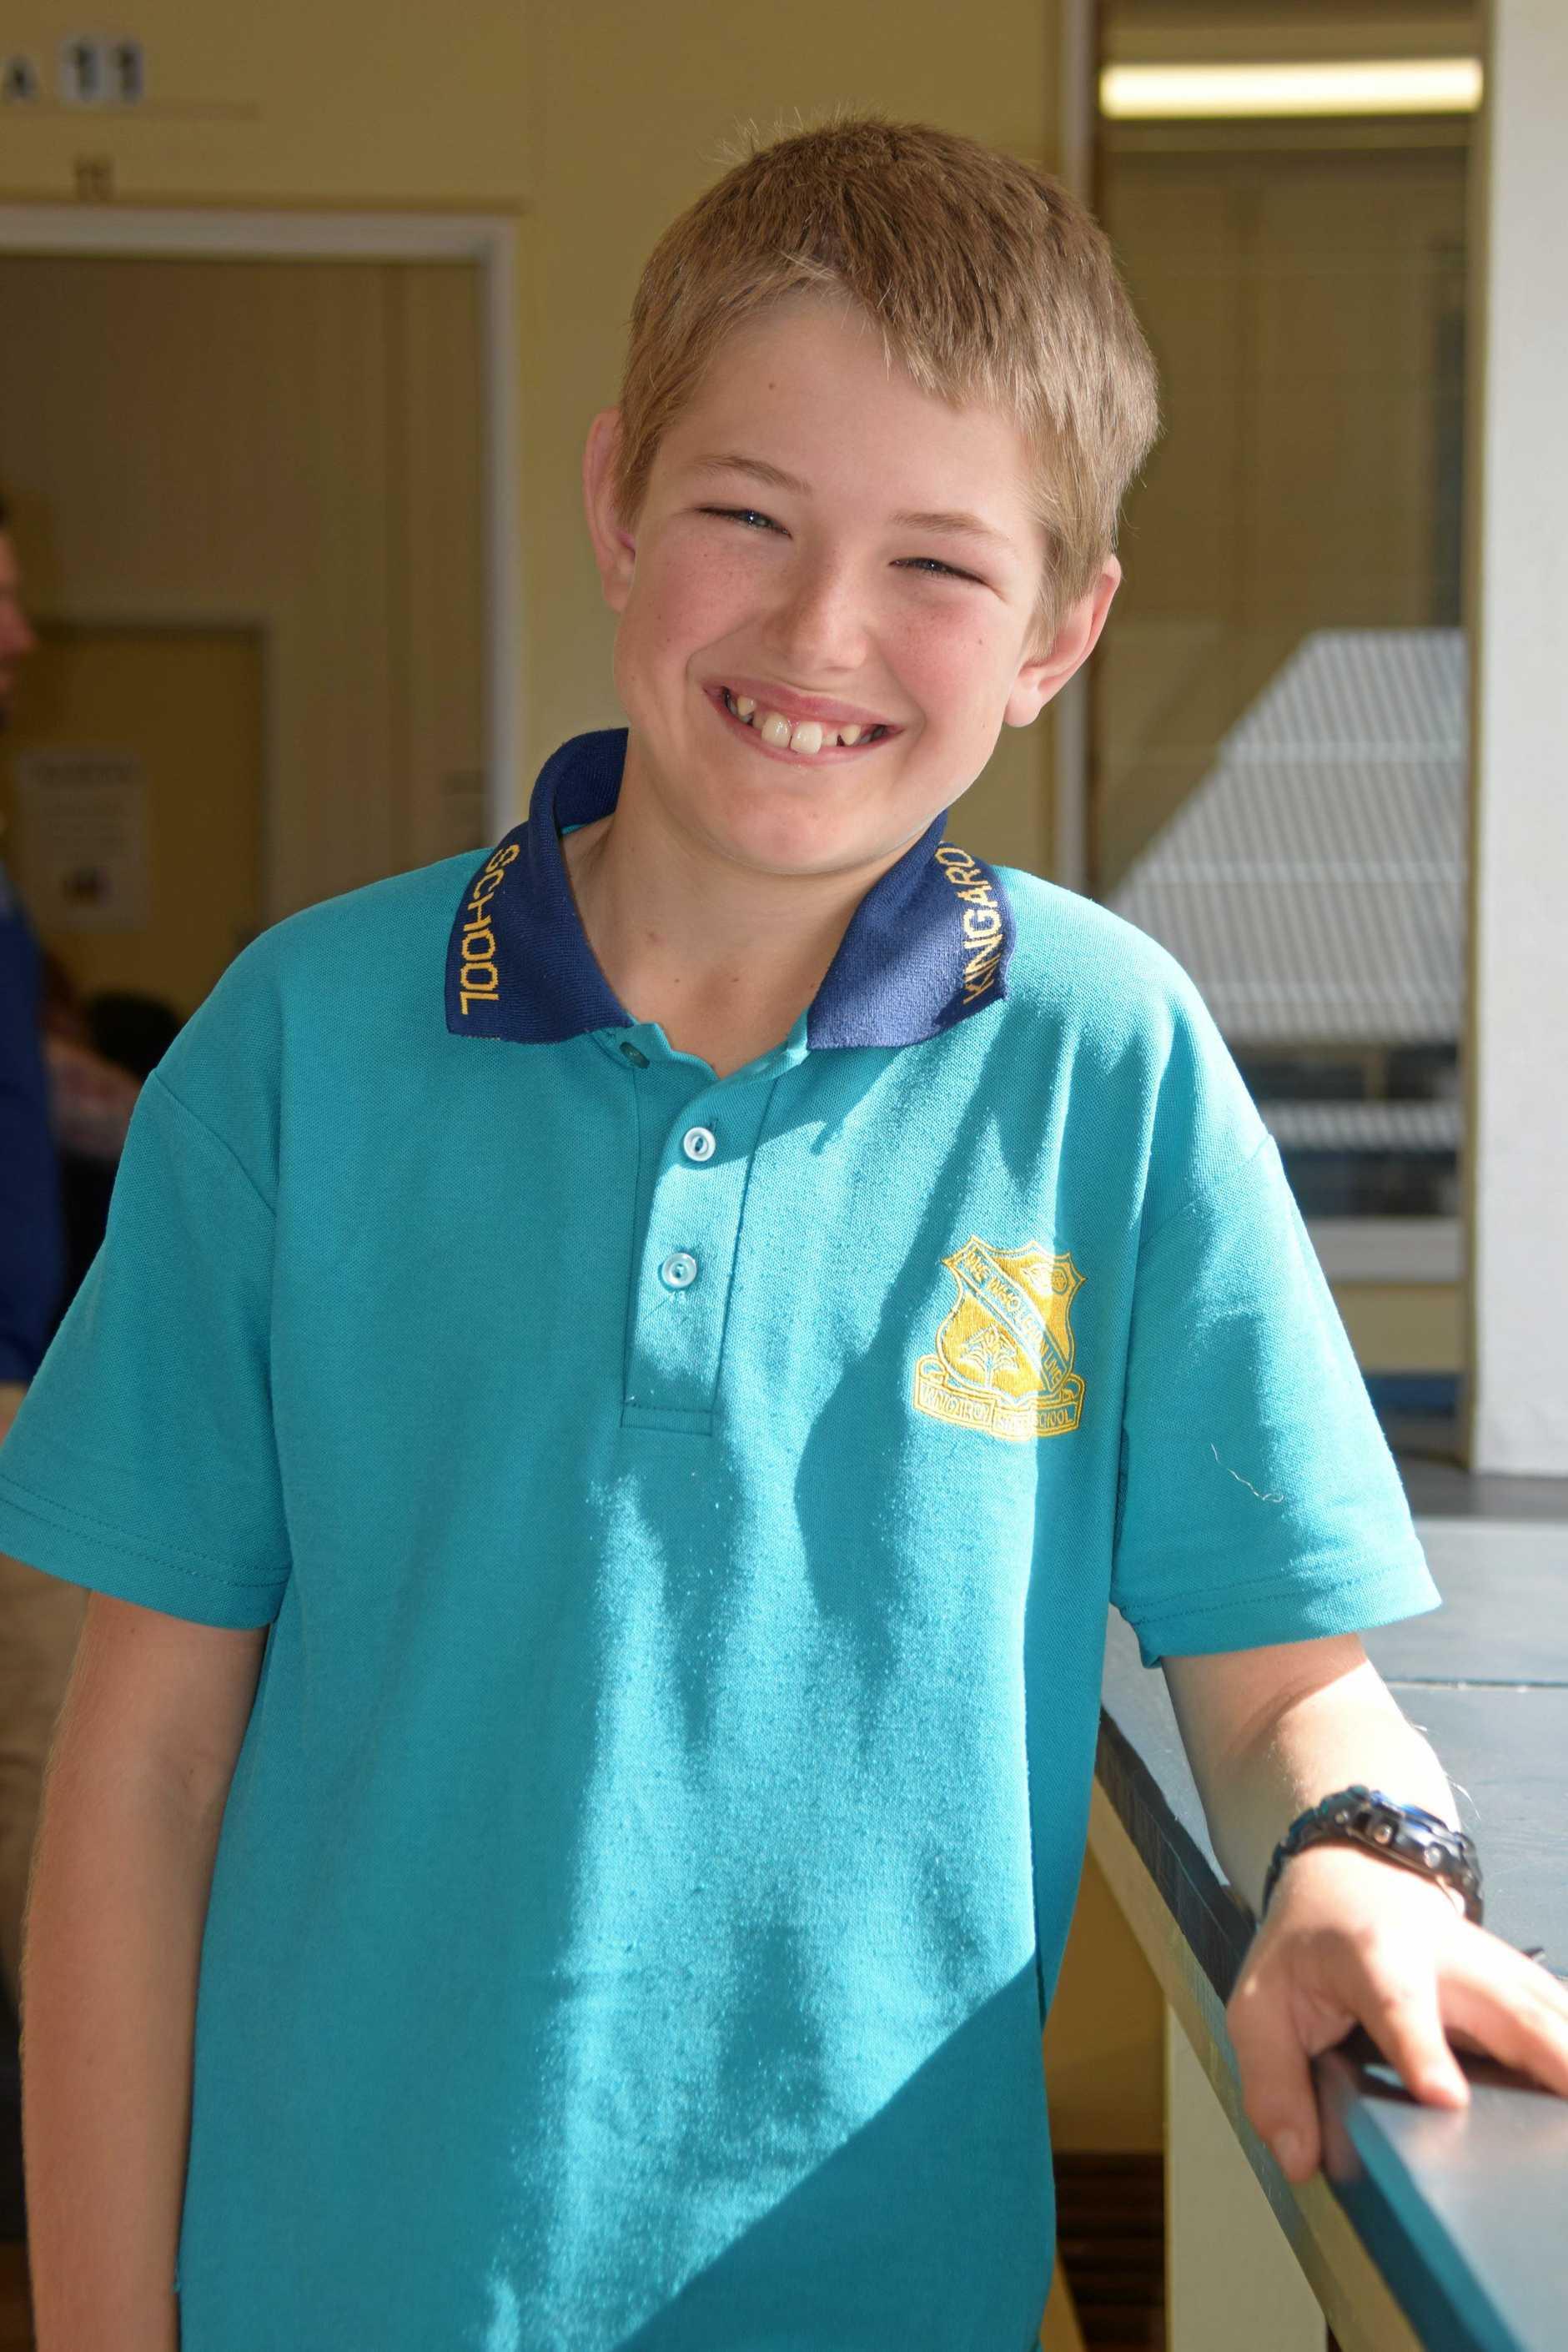 Liam Cullen is heading to his grandma's farm in Dalby.